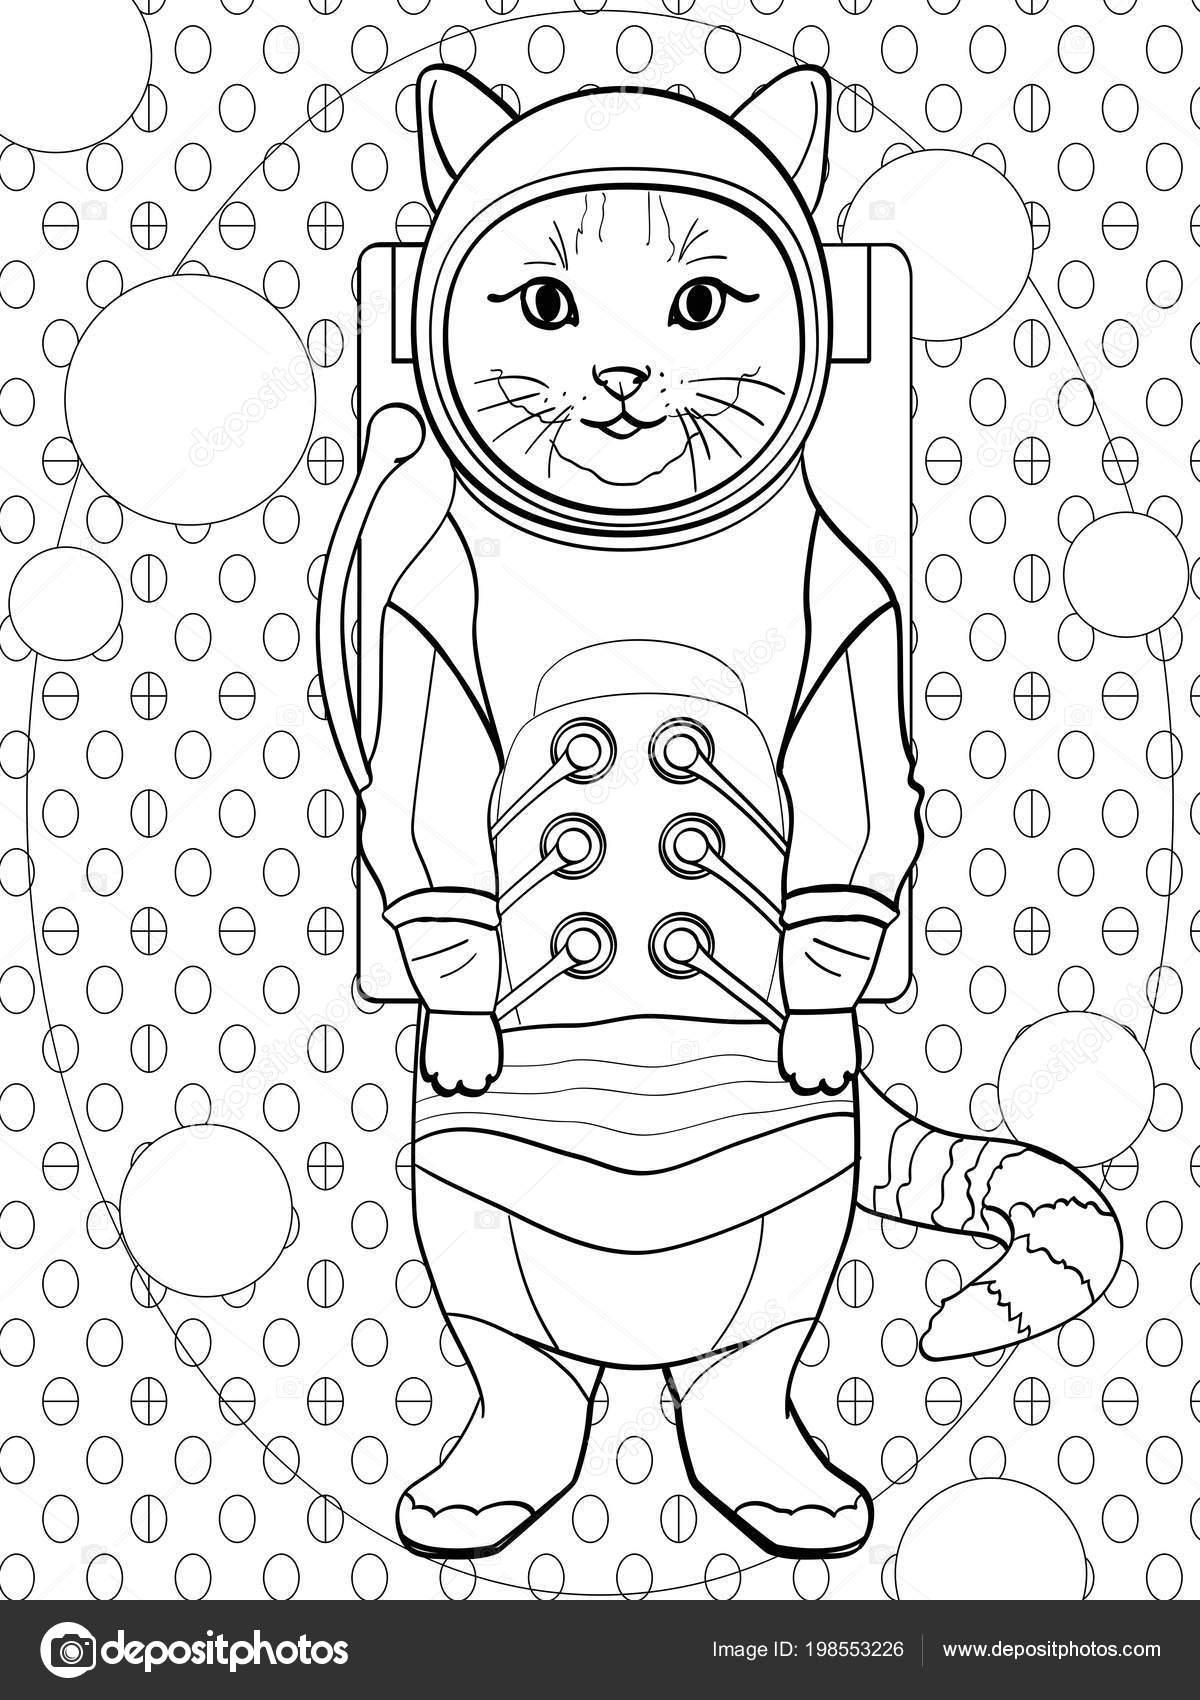 arte pop de fondo. Niños para colorear, líneas negras, gato de fondo ...